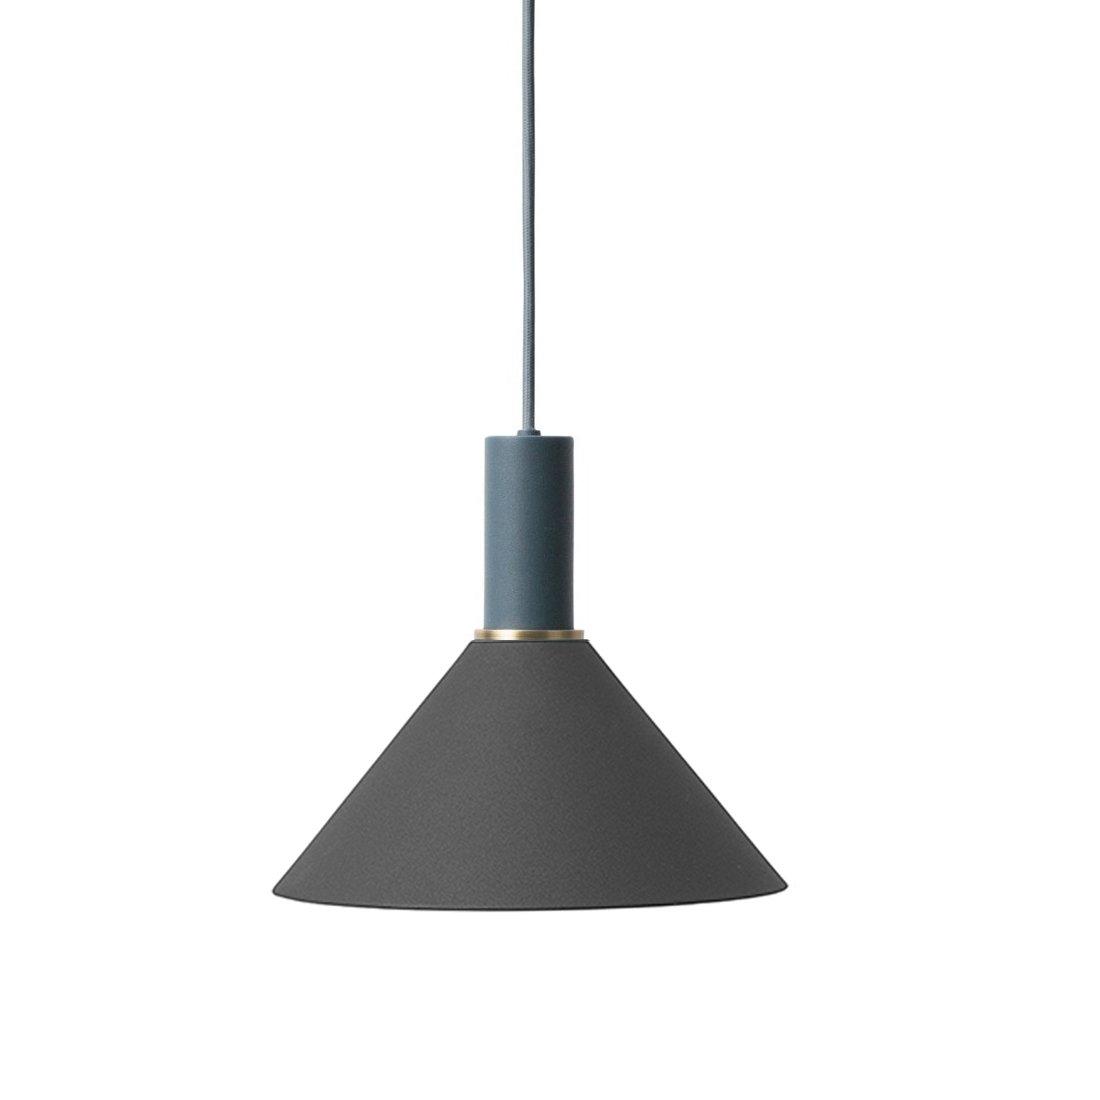 Ferm Living Collect Cone Zwart Low Hanglamp